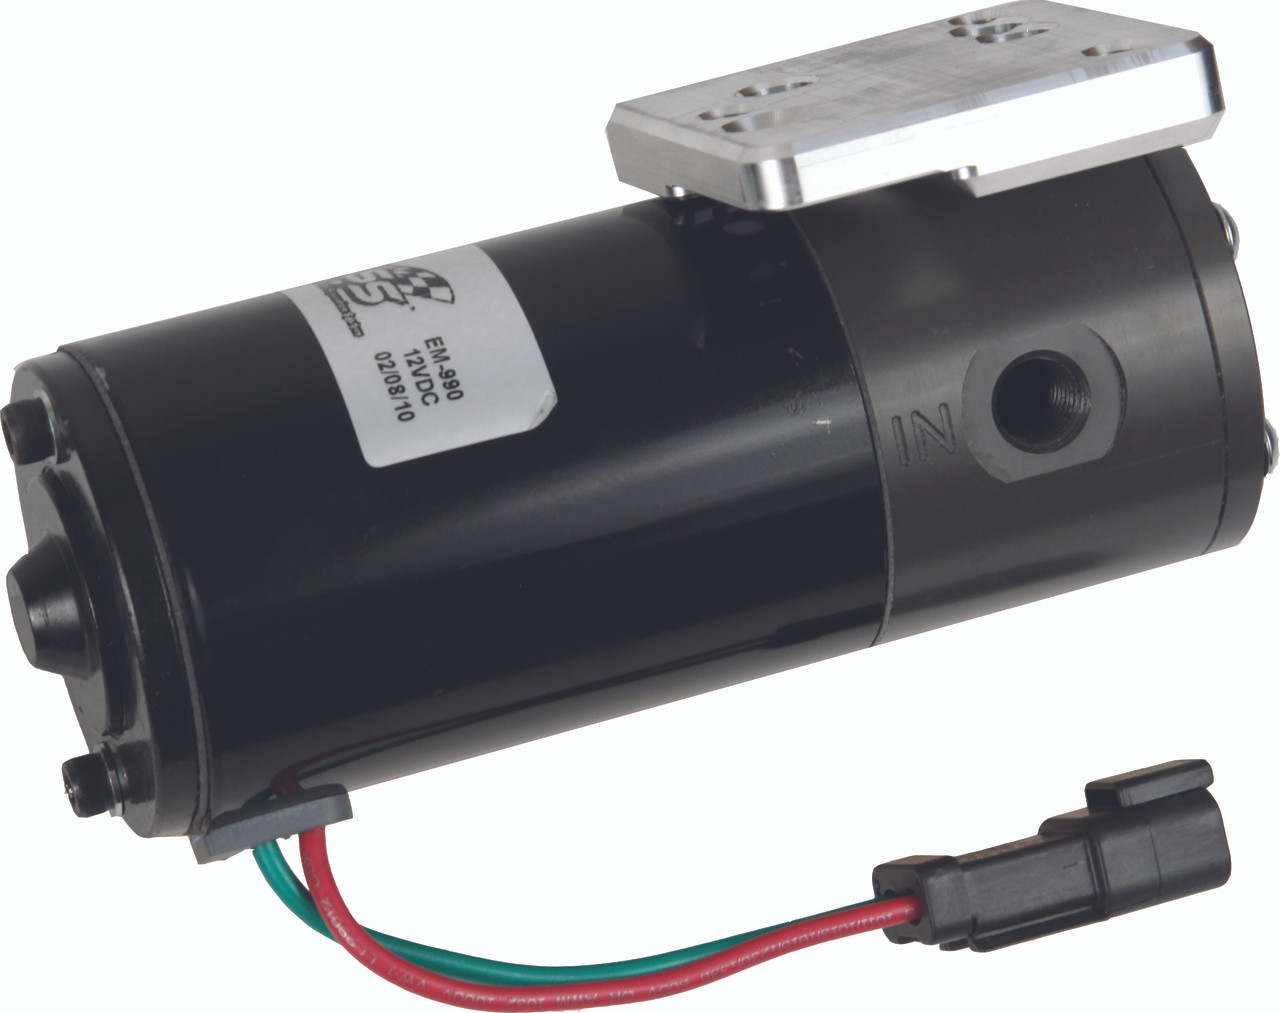 dodge ram cummins drp series diesel fuel pump by fass fuel systems [ 1280 x 1013 Pixel ]